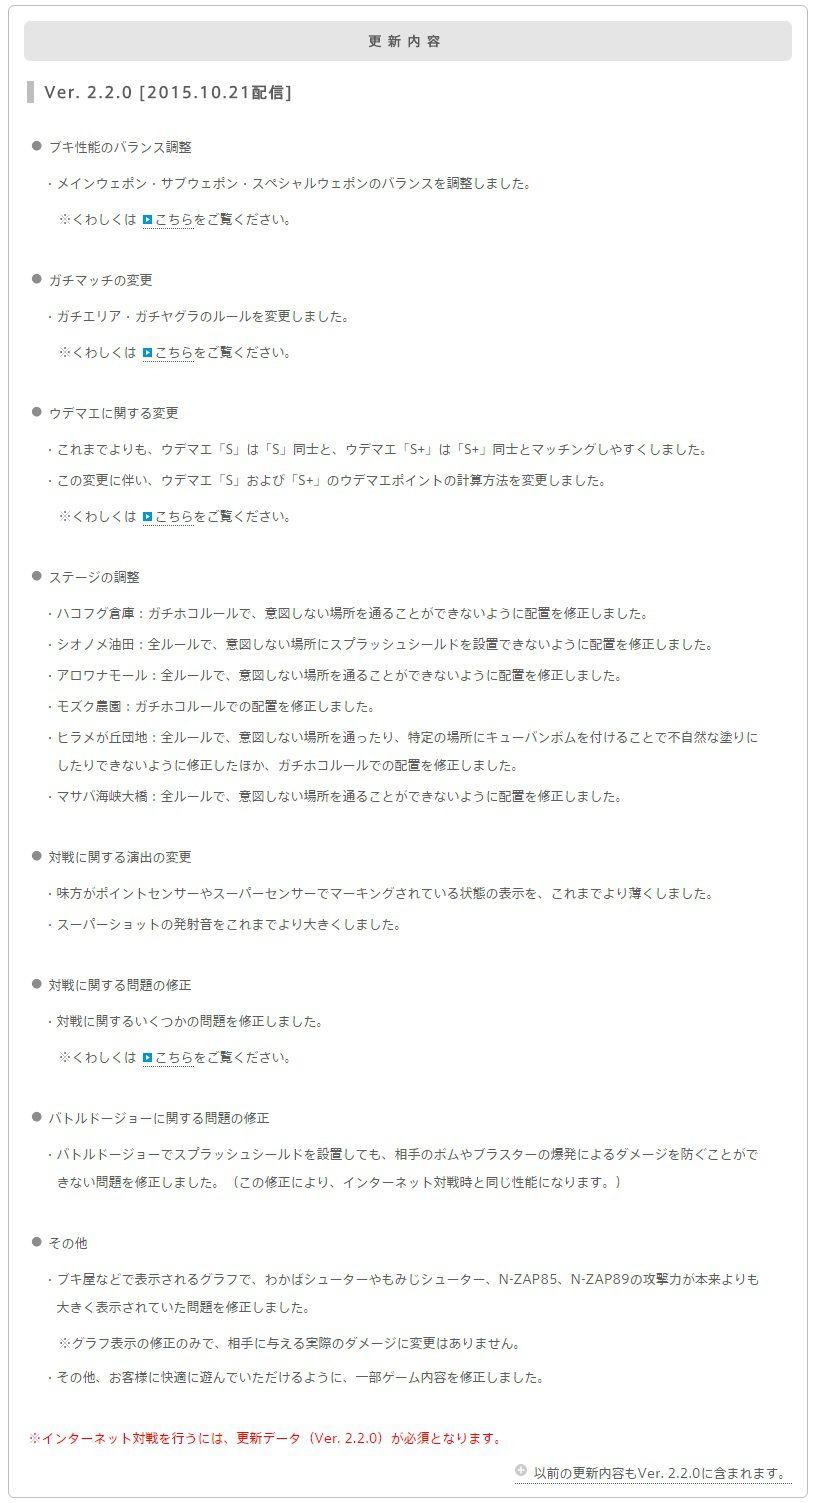 image_3162.jpg